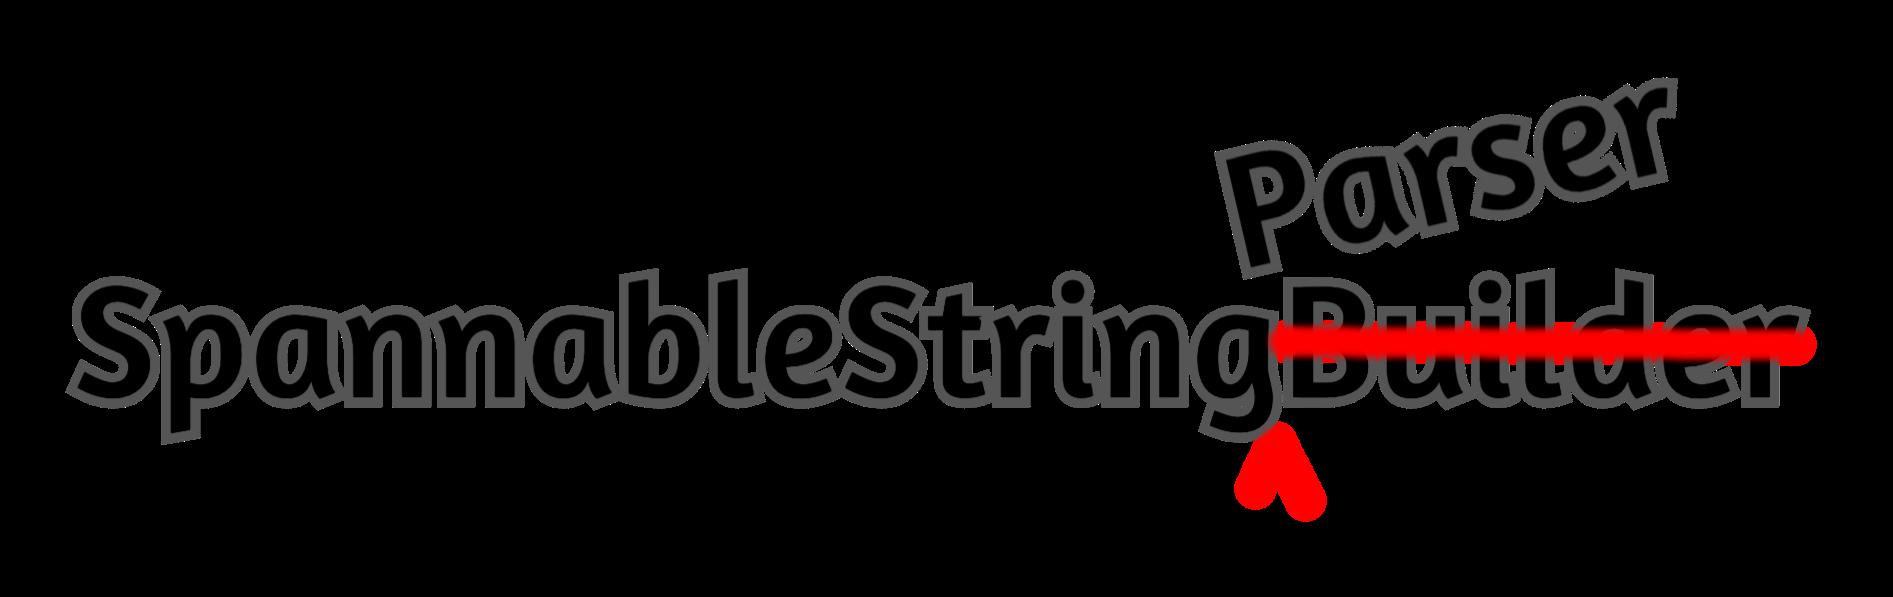 SpannableStringParser